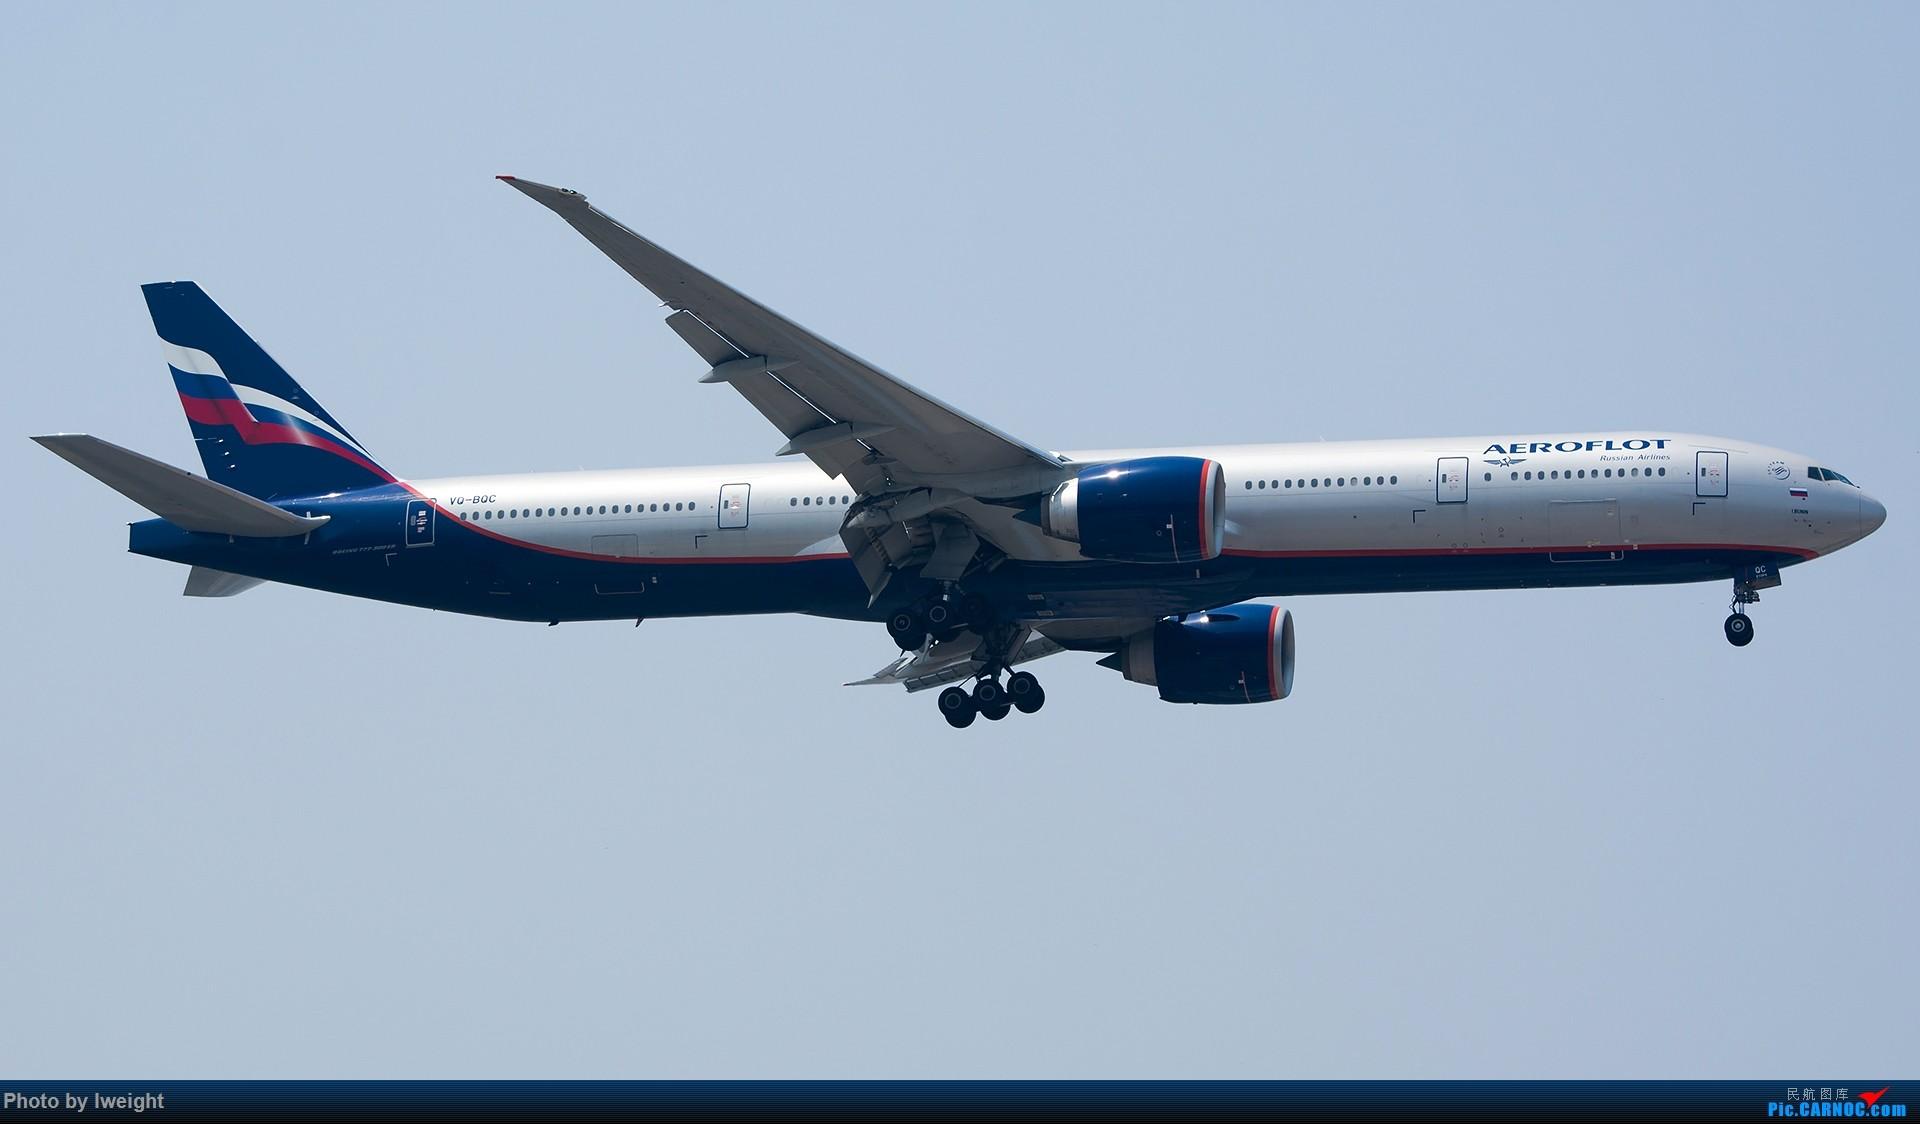 Re:[原创]周末帝都霾天拍机,凑合看看吧【2015-5-23】 BOEING 777-300ER VQ-BQC 中国北京首都国际机场